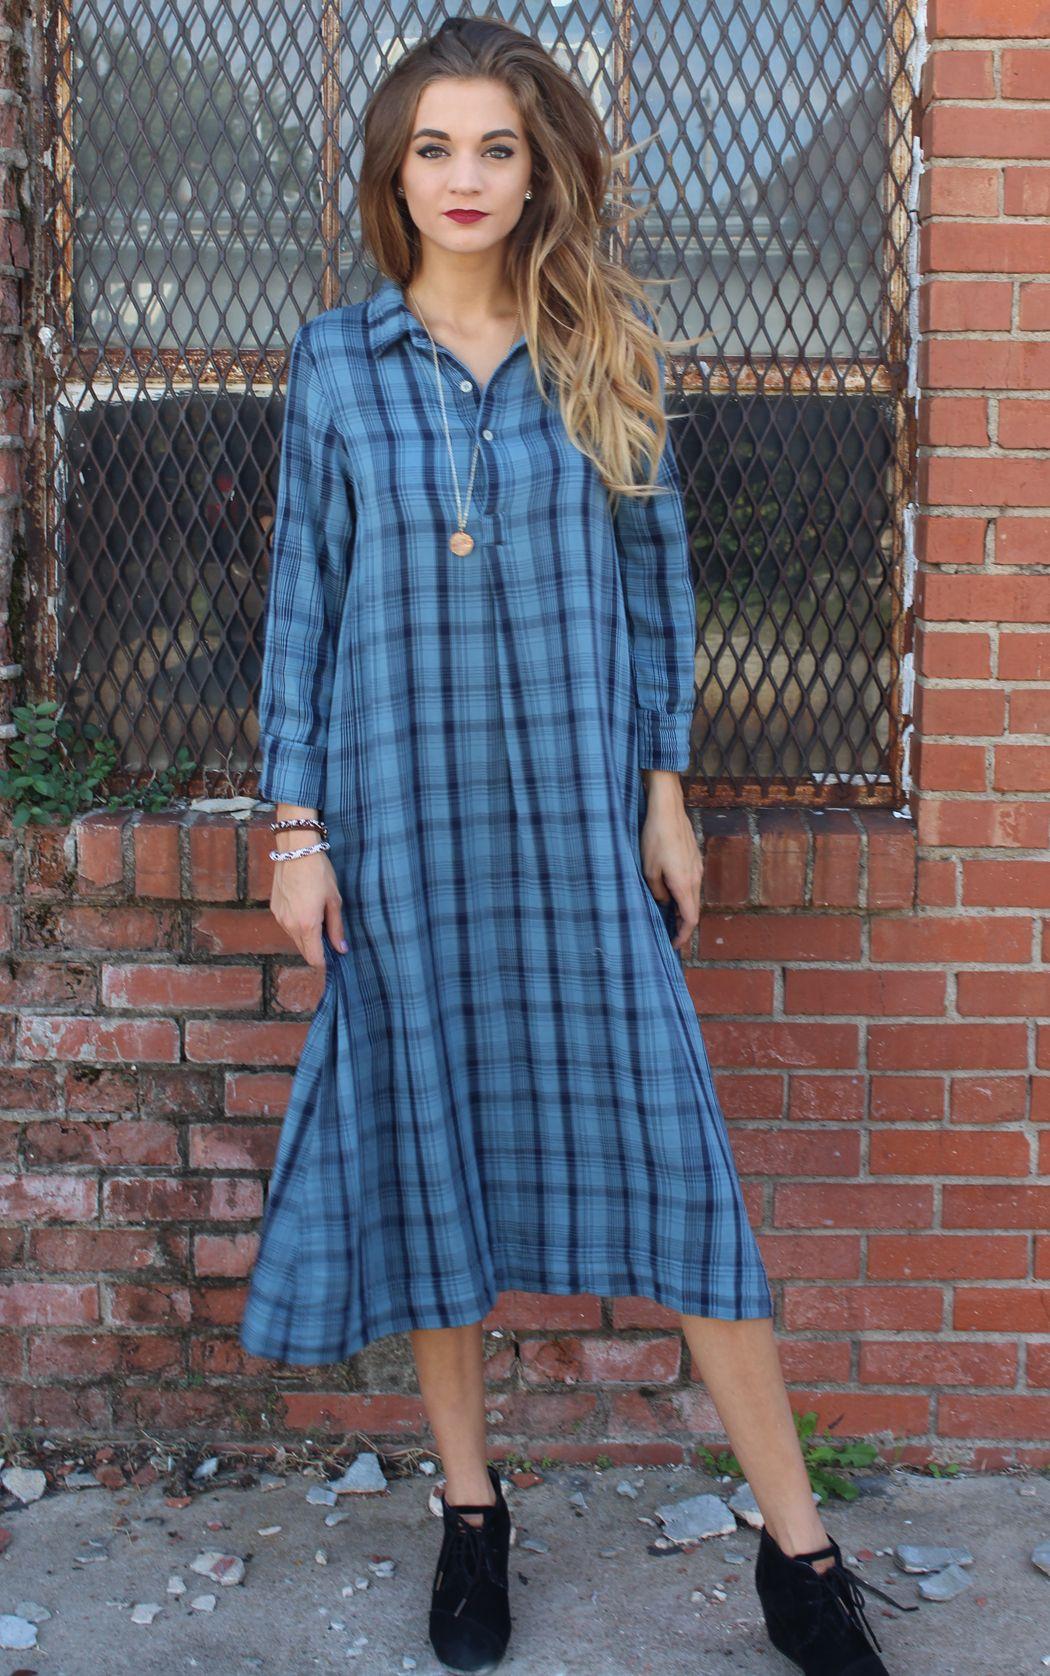 Rummer Dress - Blue Navy Plaid | CP Shades | It's a Shopping Thing